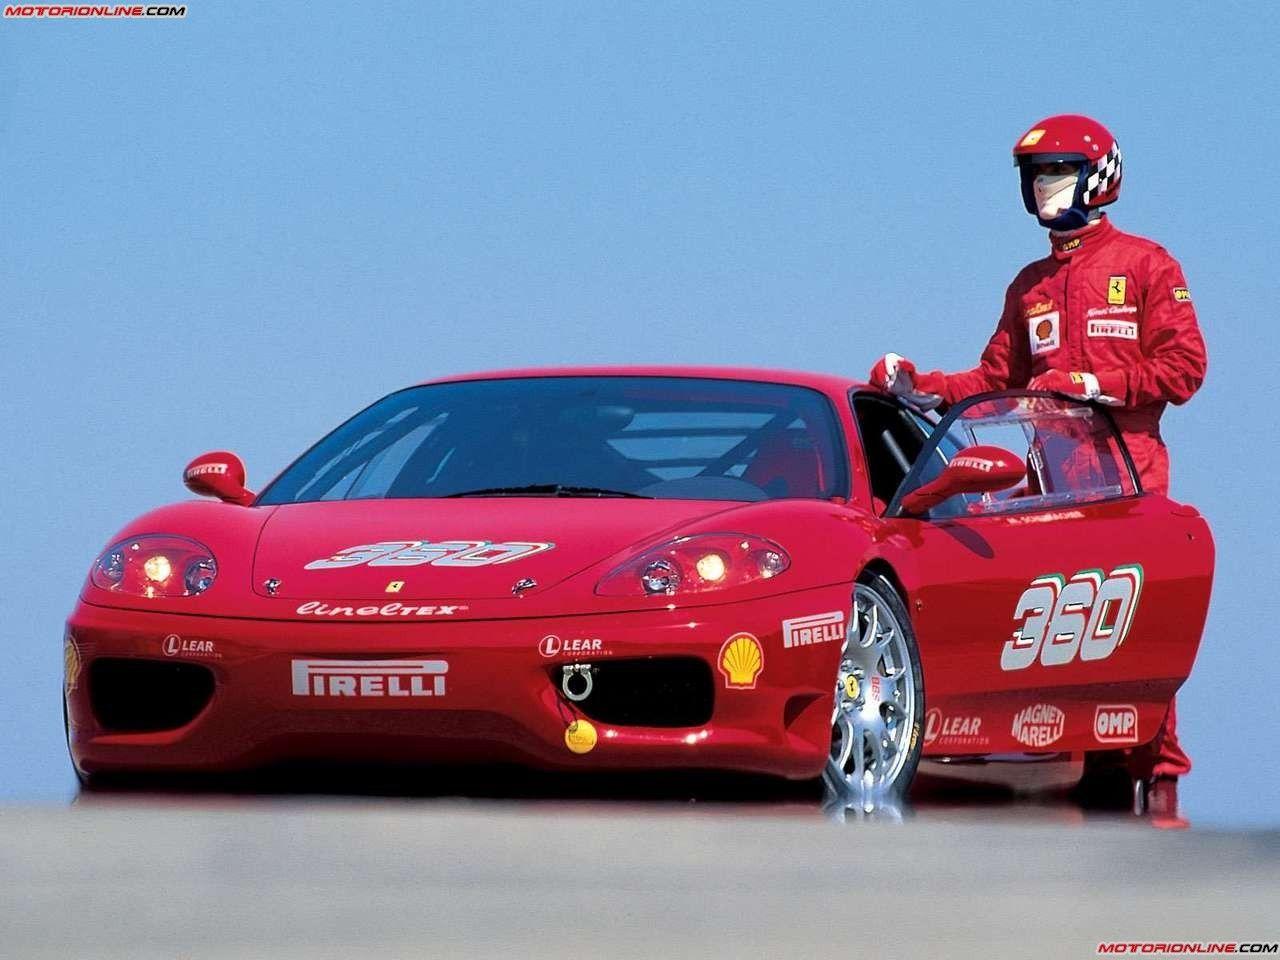 2001 Ferrari 360 Modena Challenge Ferrari 360 Cars For Sale